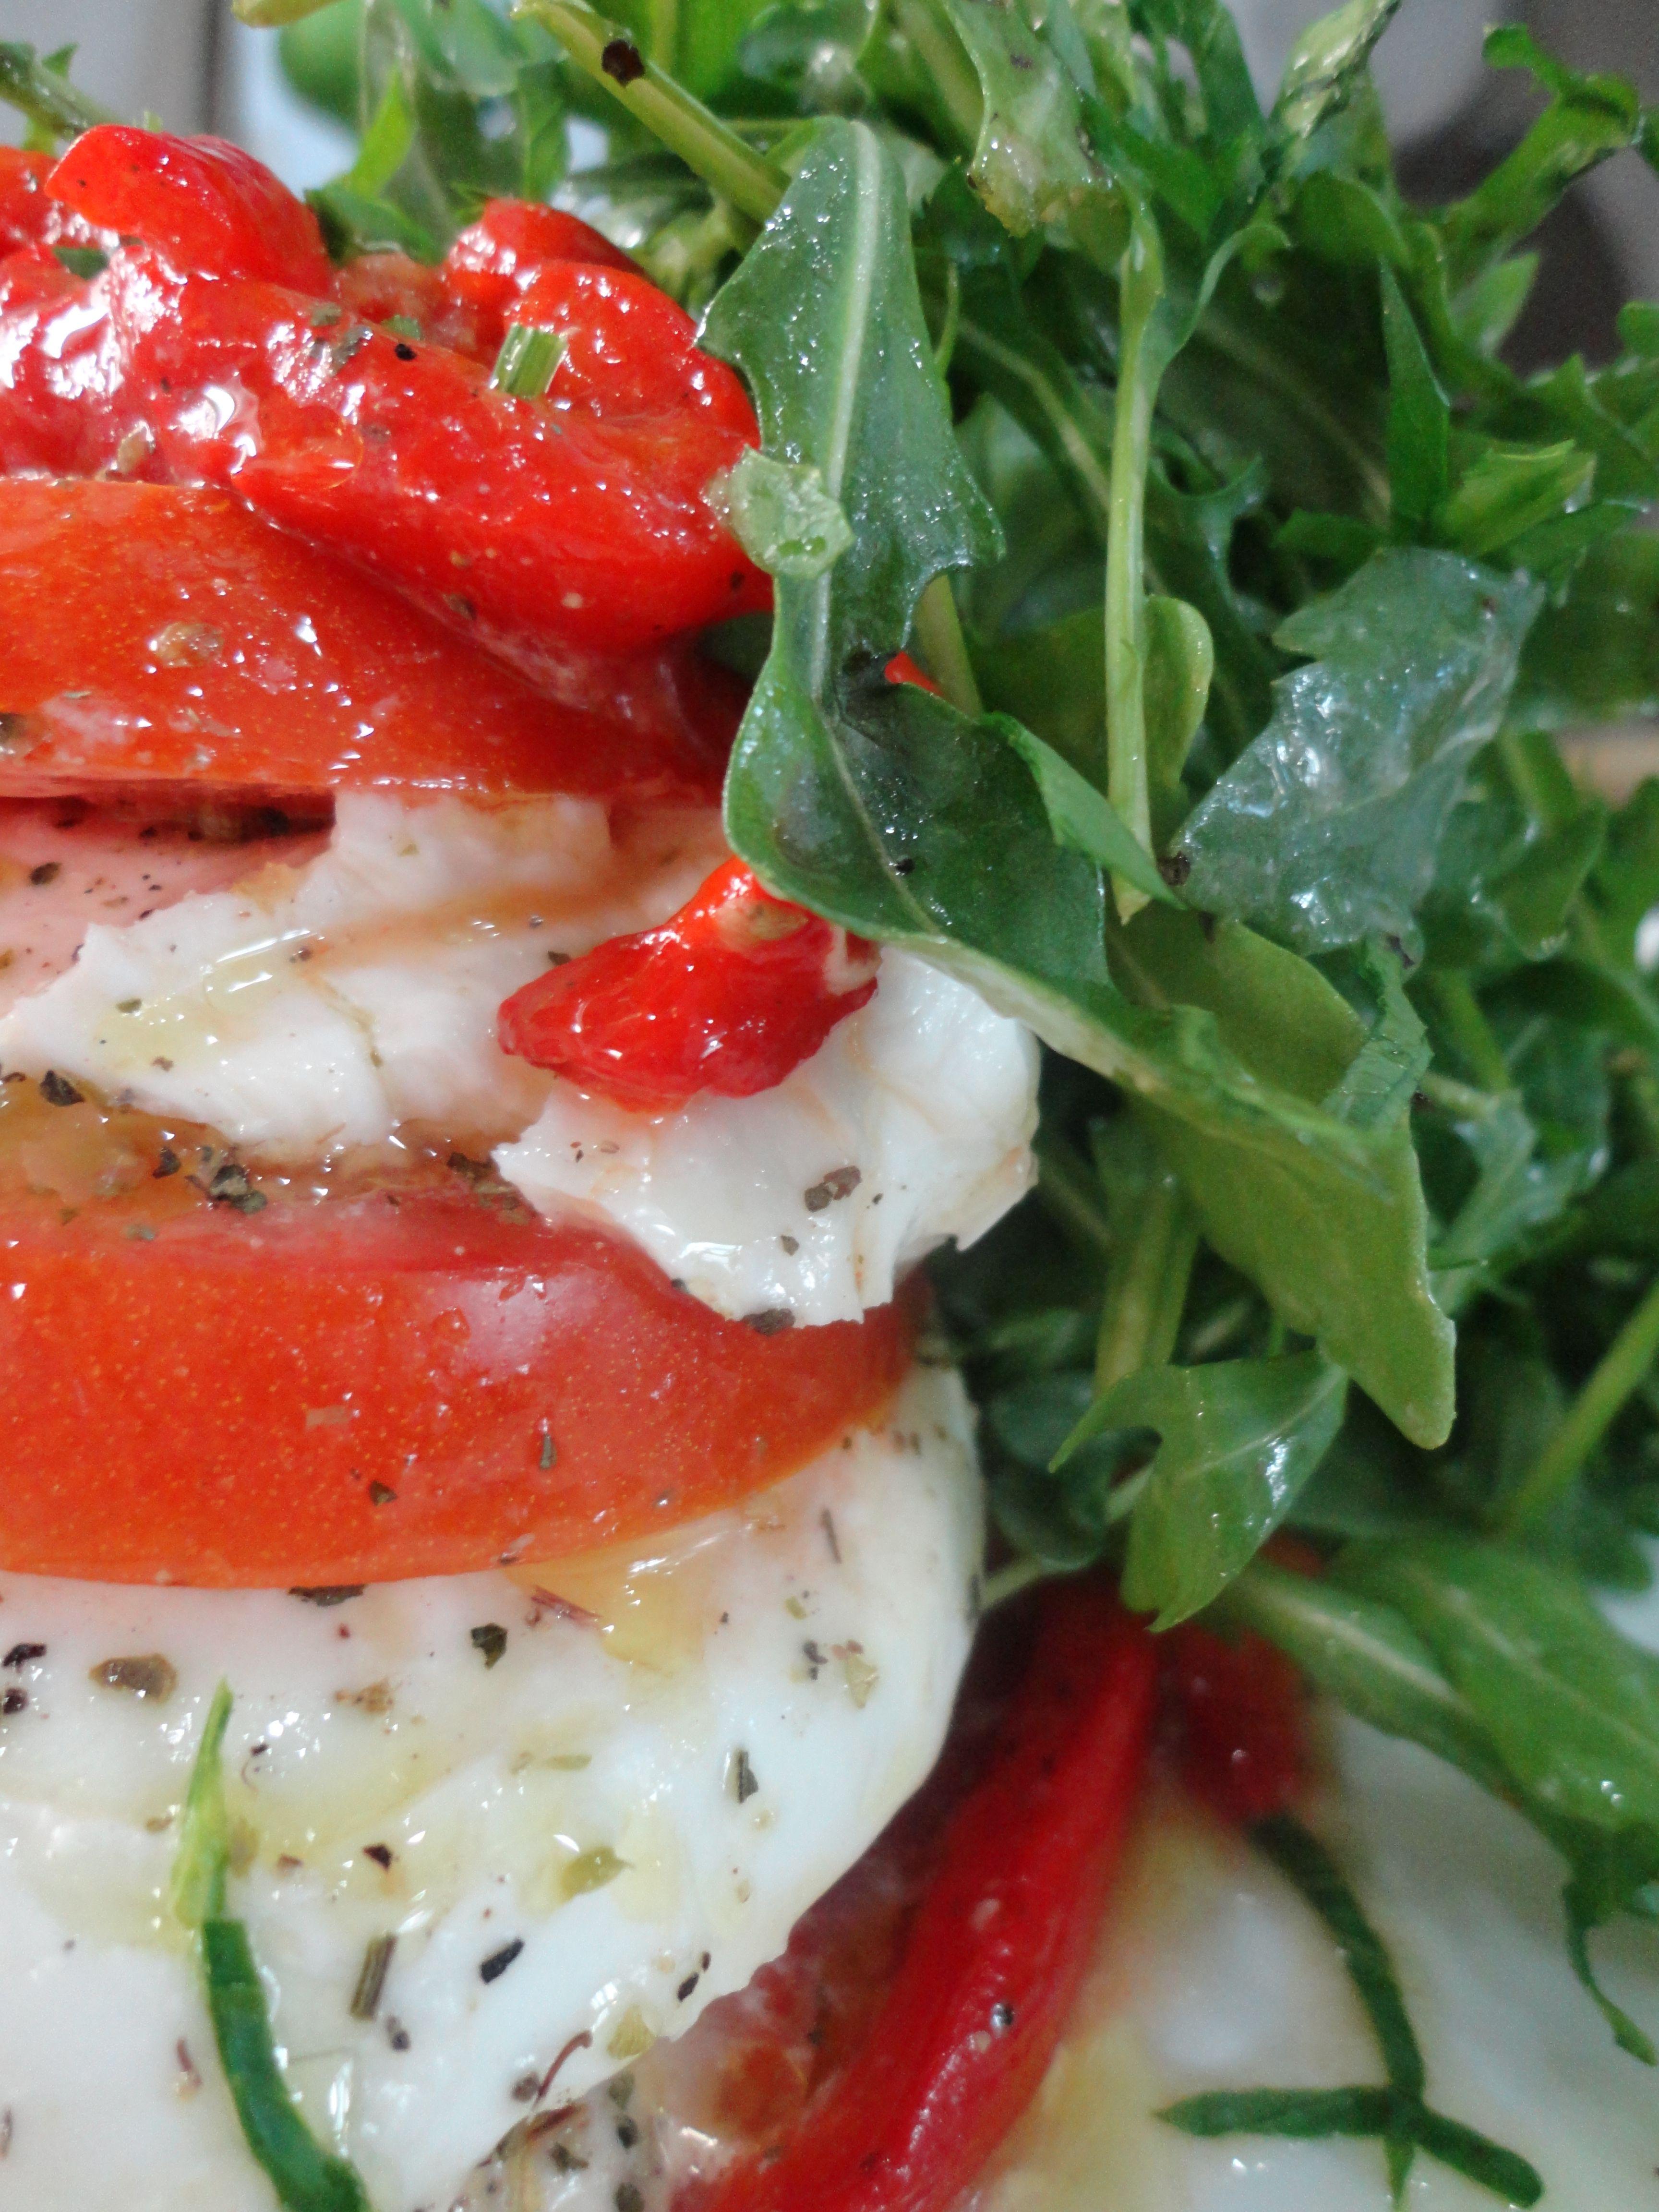 Roasted Sweet Bell Pepper, fresh tomatoes slices, fresh basil, mozzarella di bufala d.o.p.